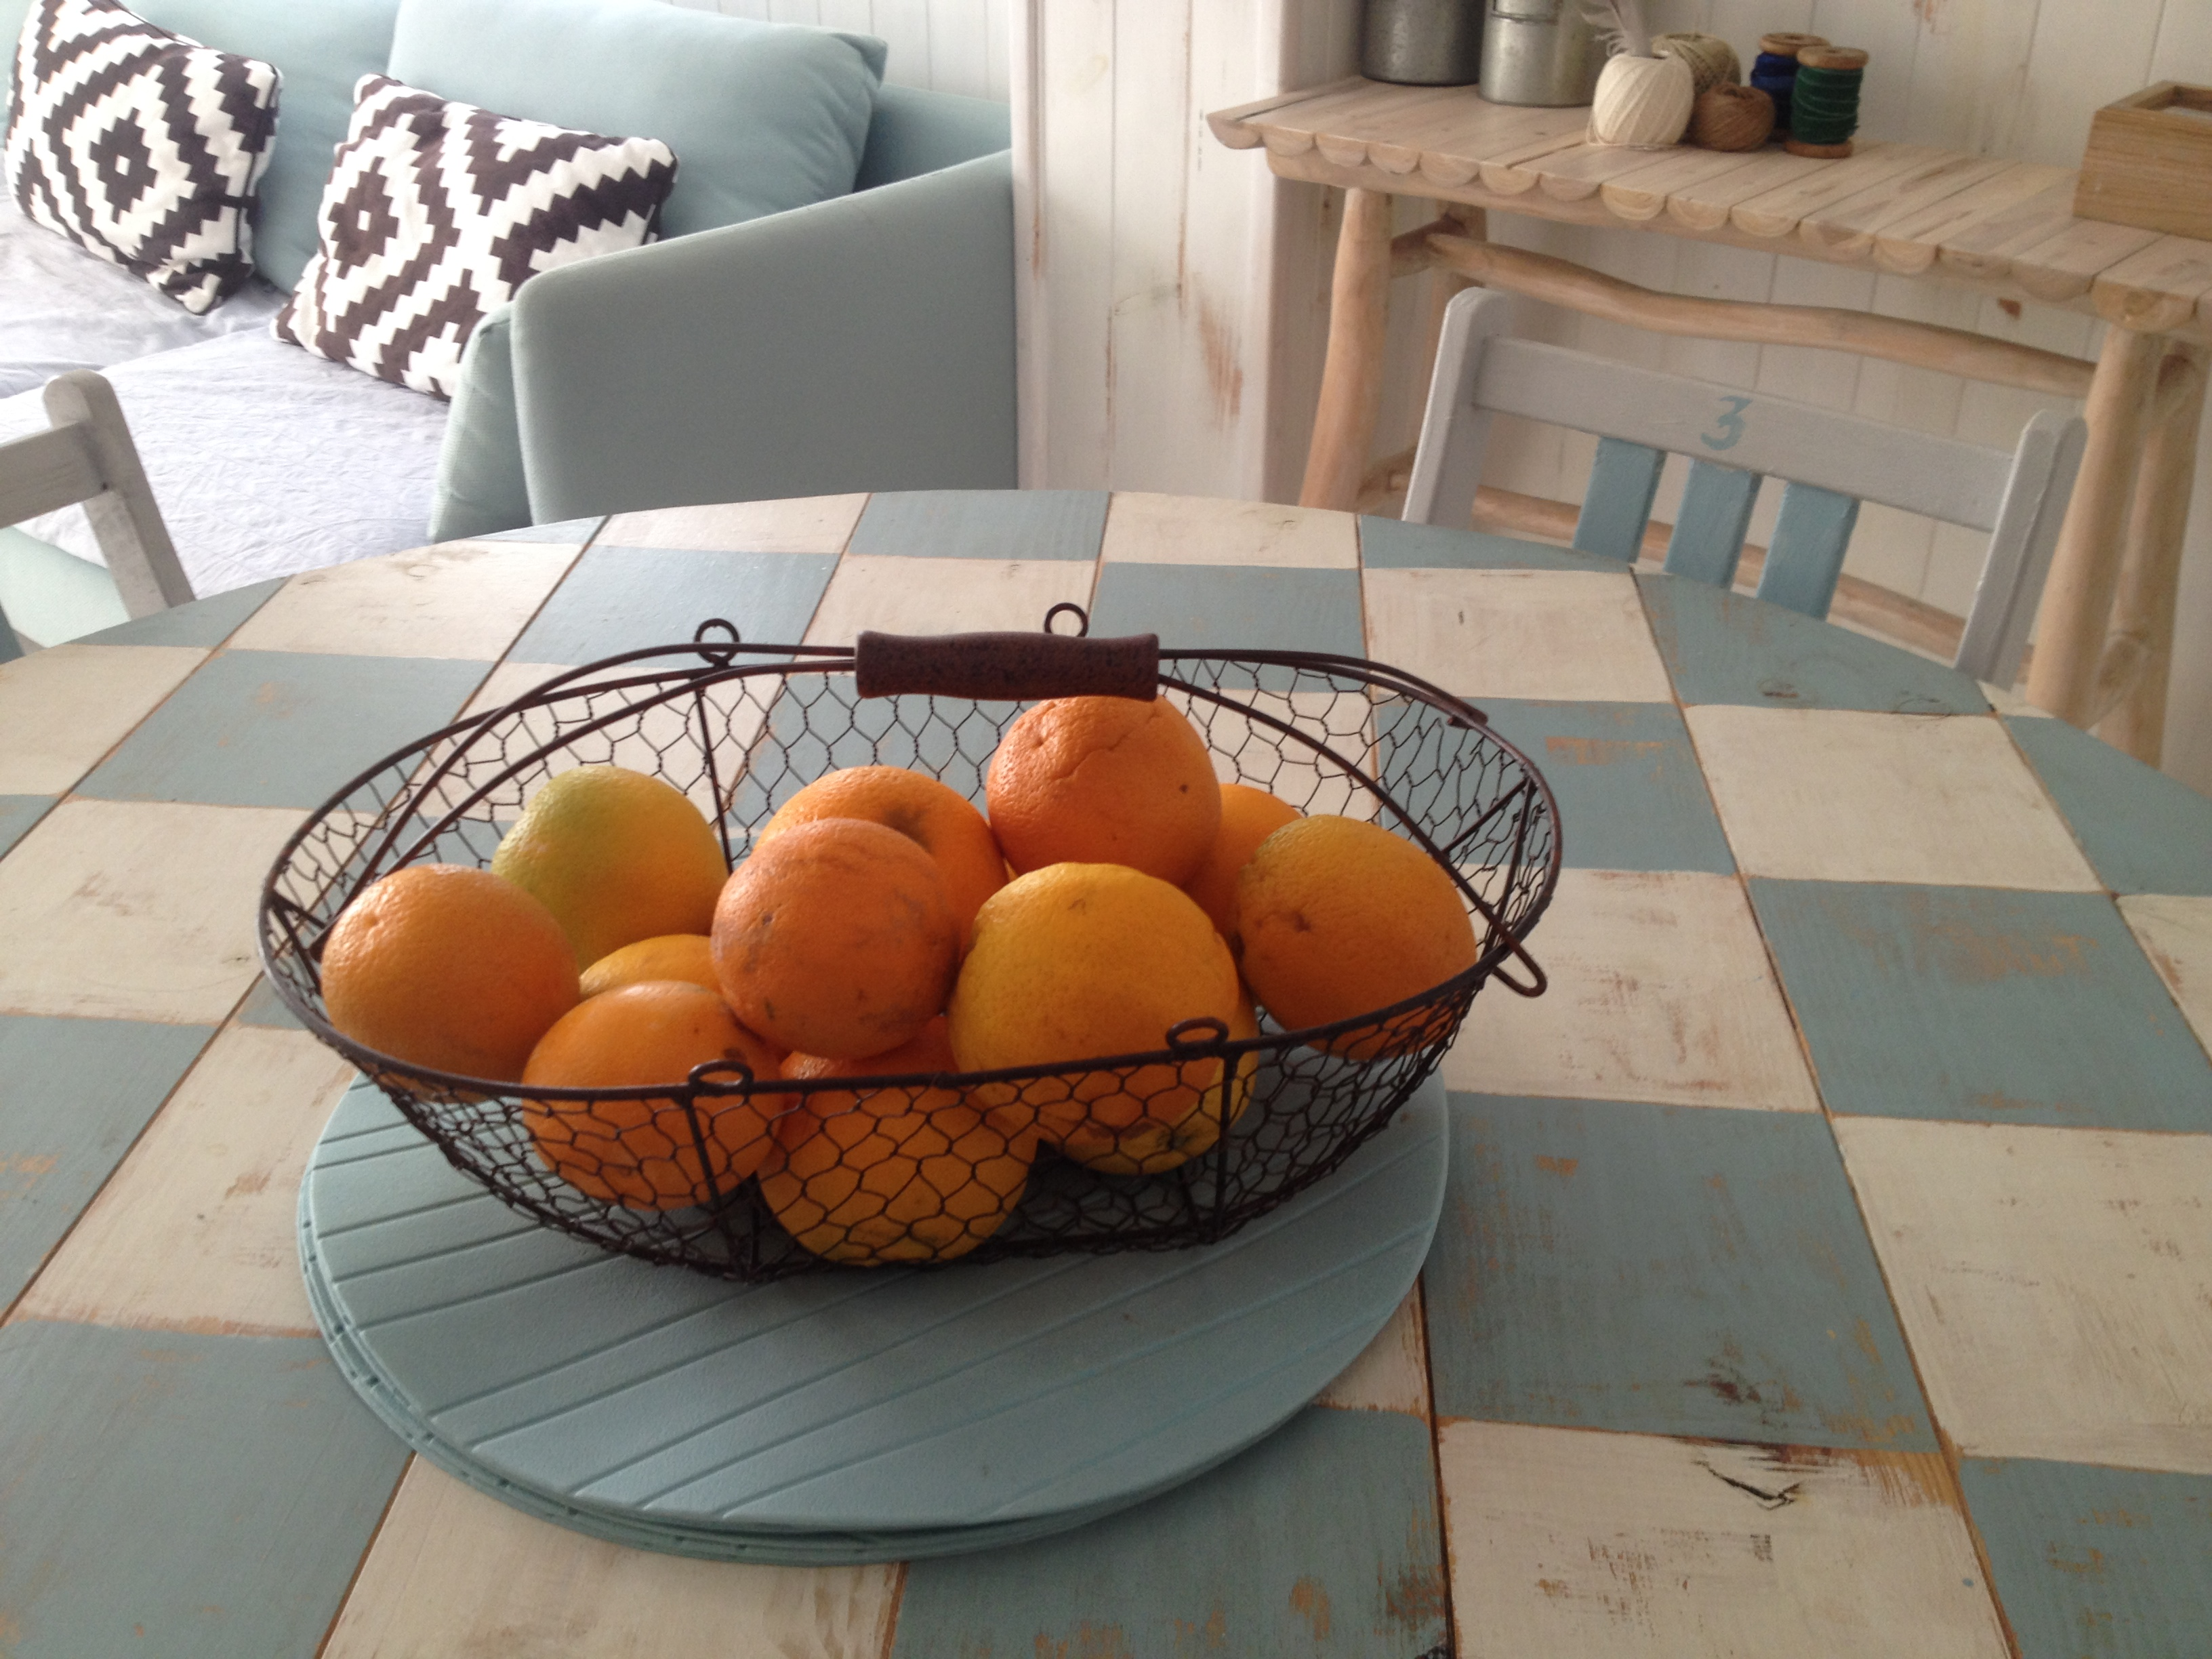 naranjas frescas siempre